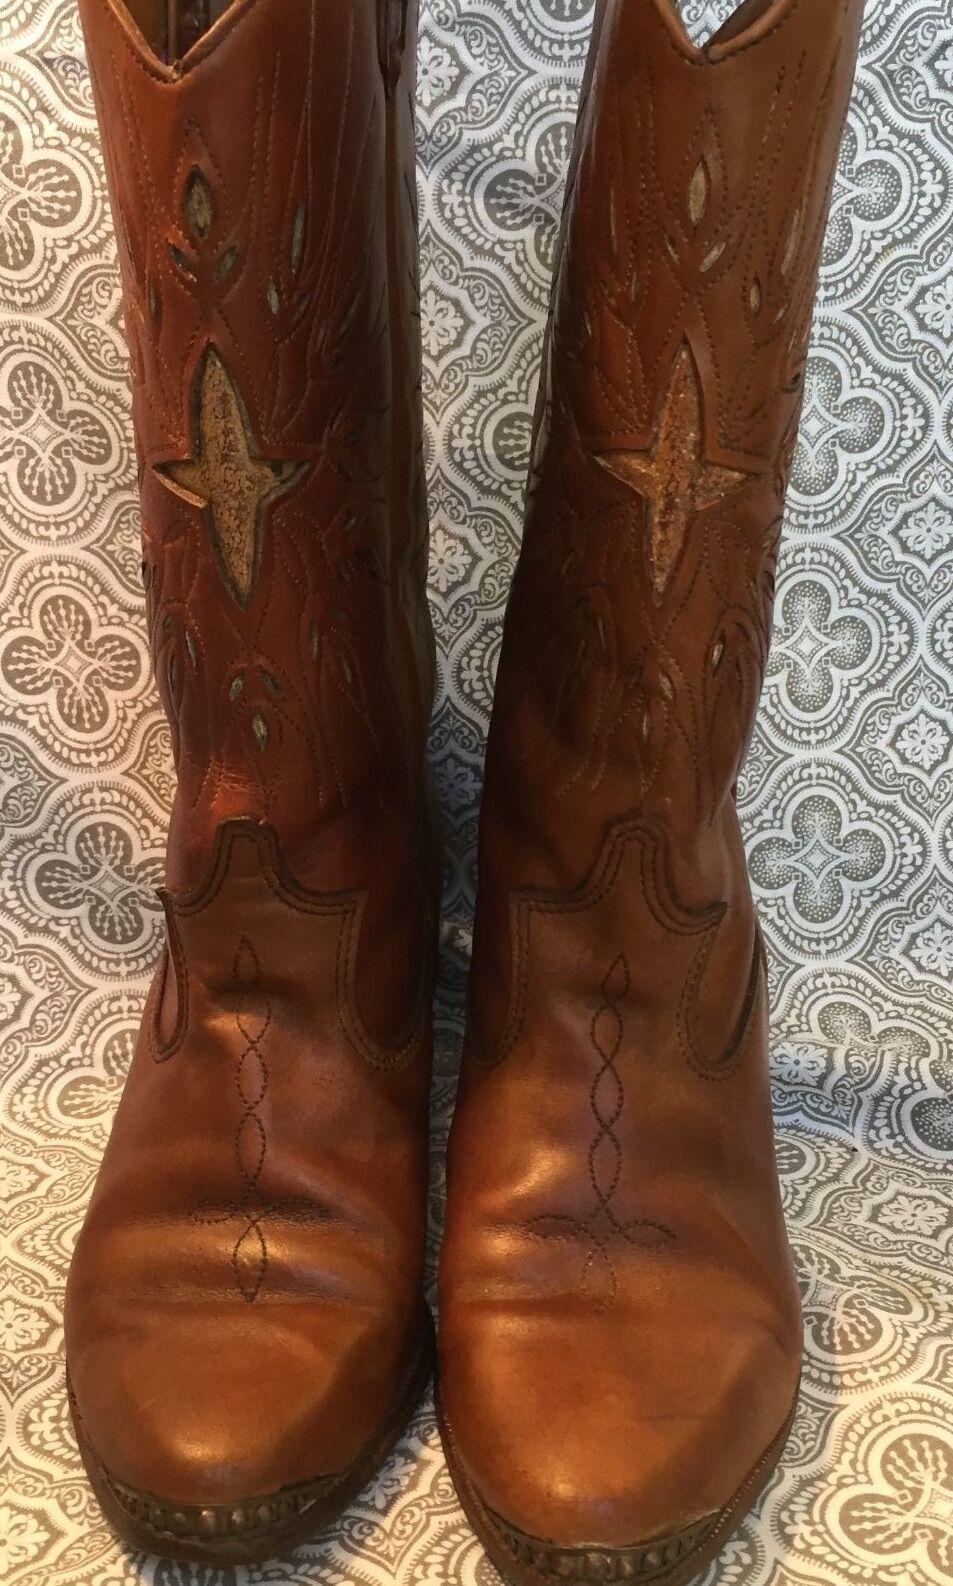 Dingo Talon Cowboy Western marron incrustation Caps bottes en cuir femme 6.5 USA  37